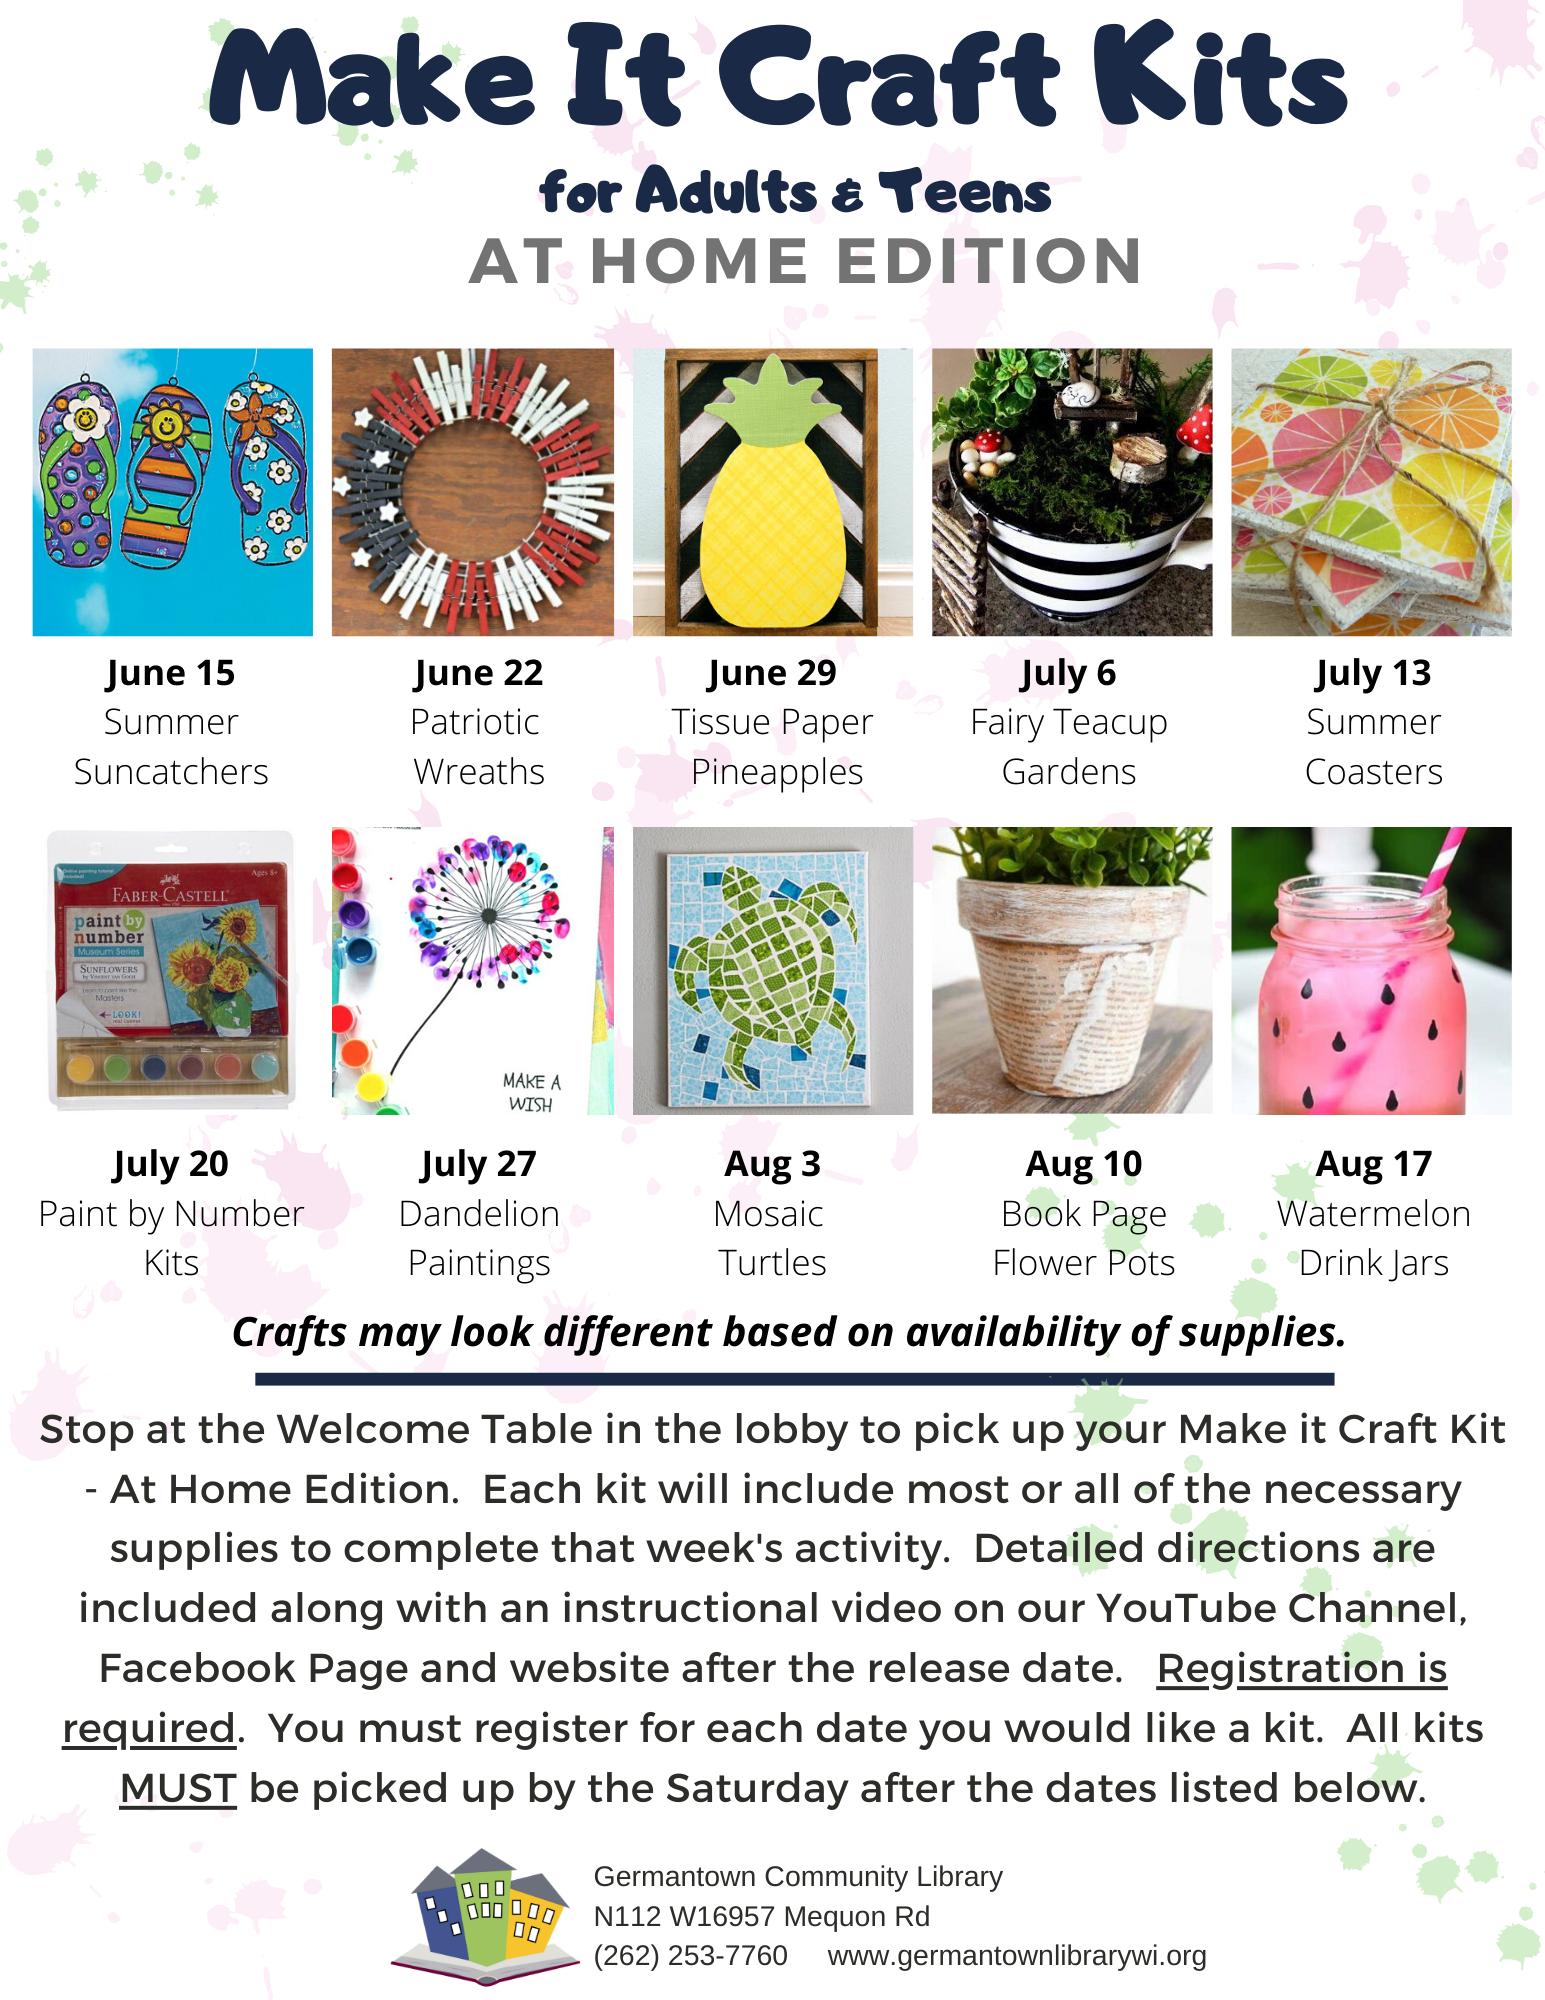 Make It Craft Kits - At Home Edition (Watermelon Drink Jars)